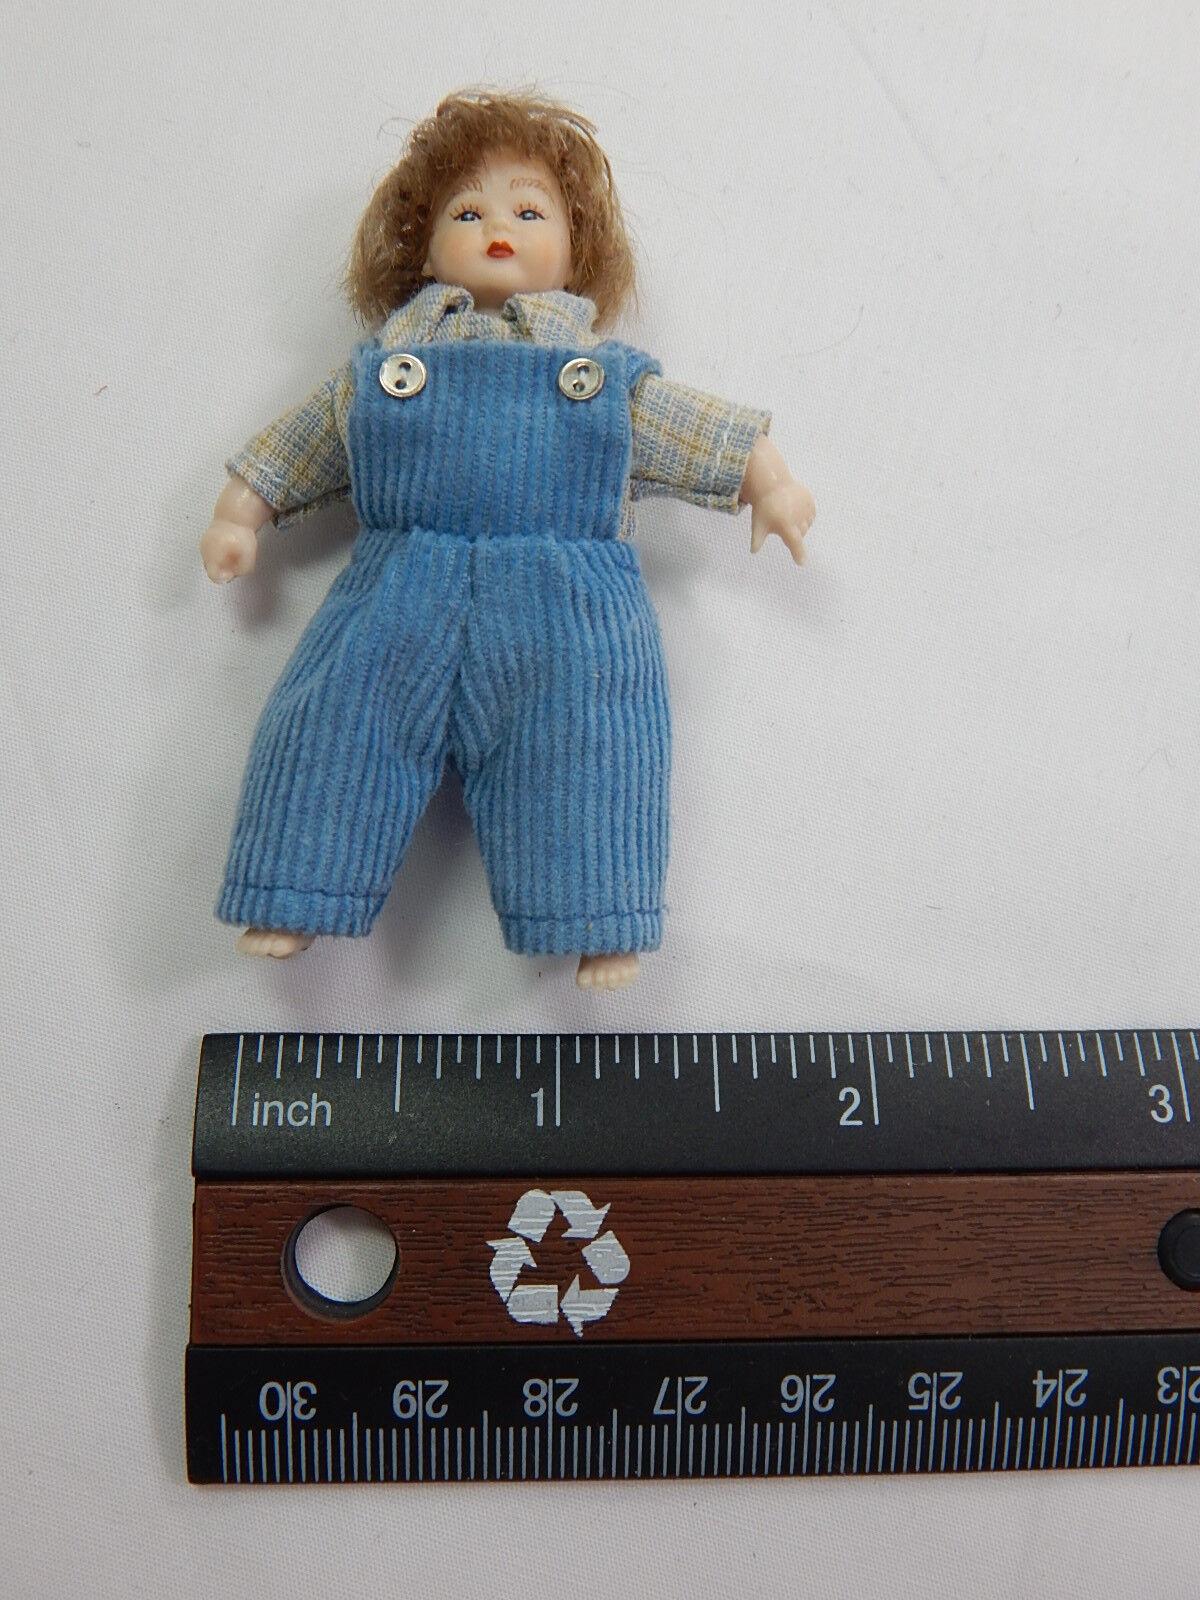 Heidi Ott  Dollhouse Miniature 1:12 Scale Baby  2    XB515